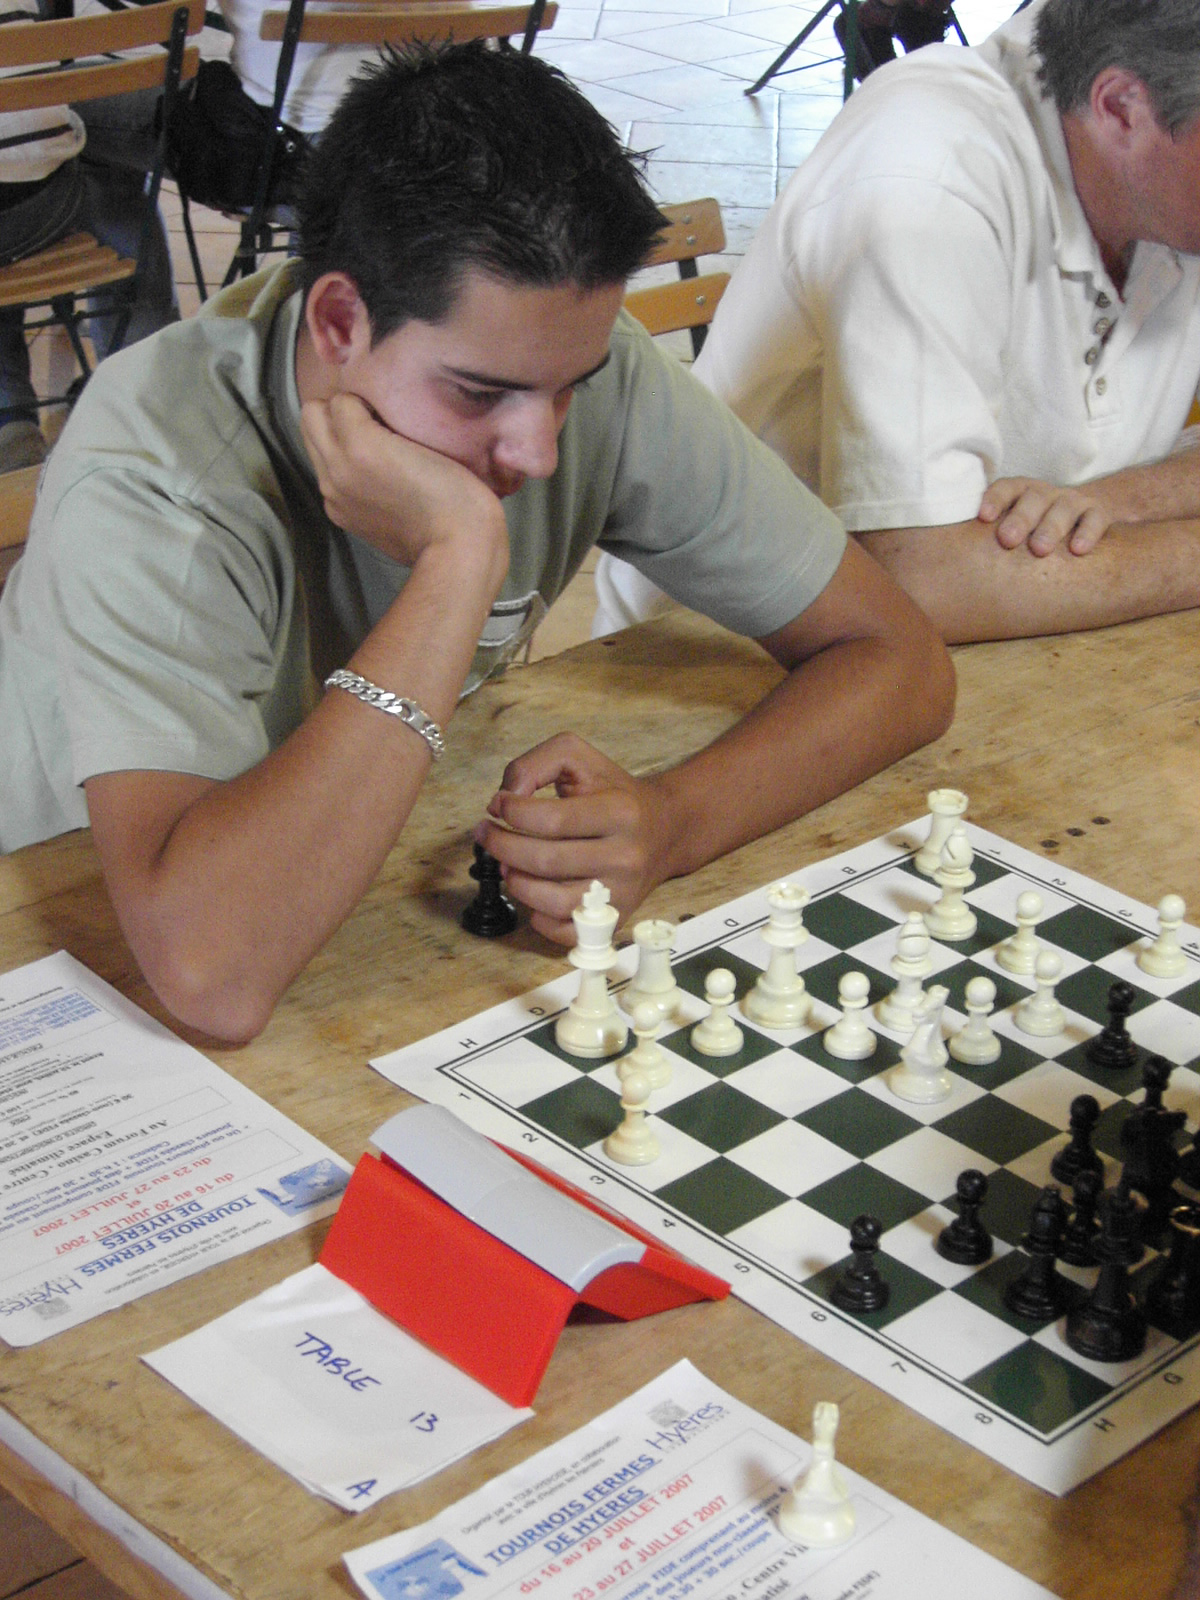 Grand Prix Arcois 2007 (51) Jordi Urrutia